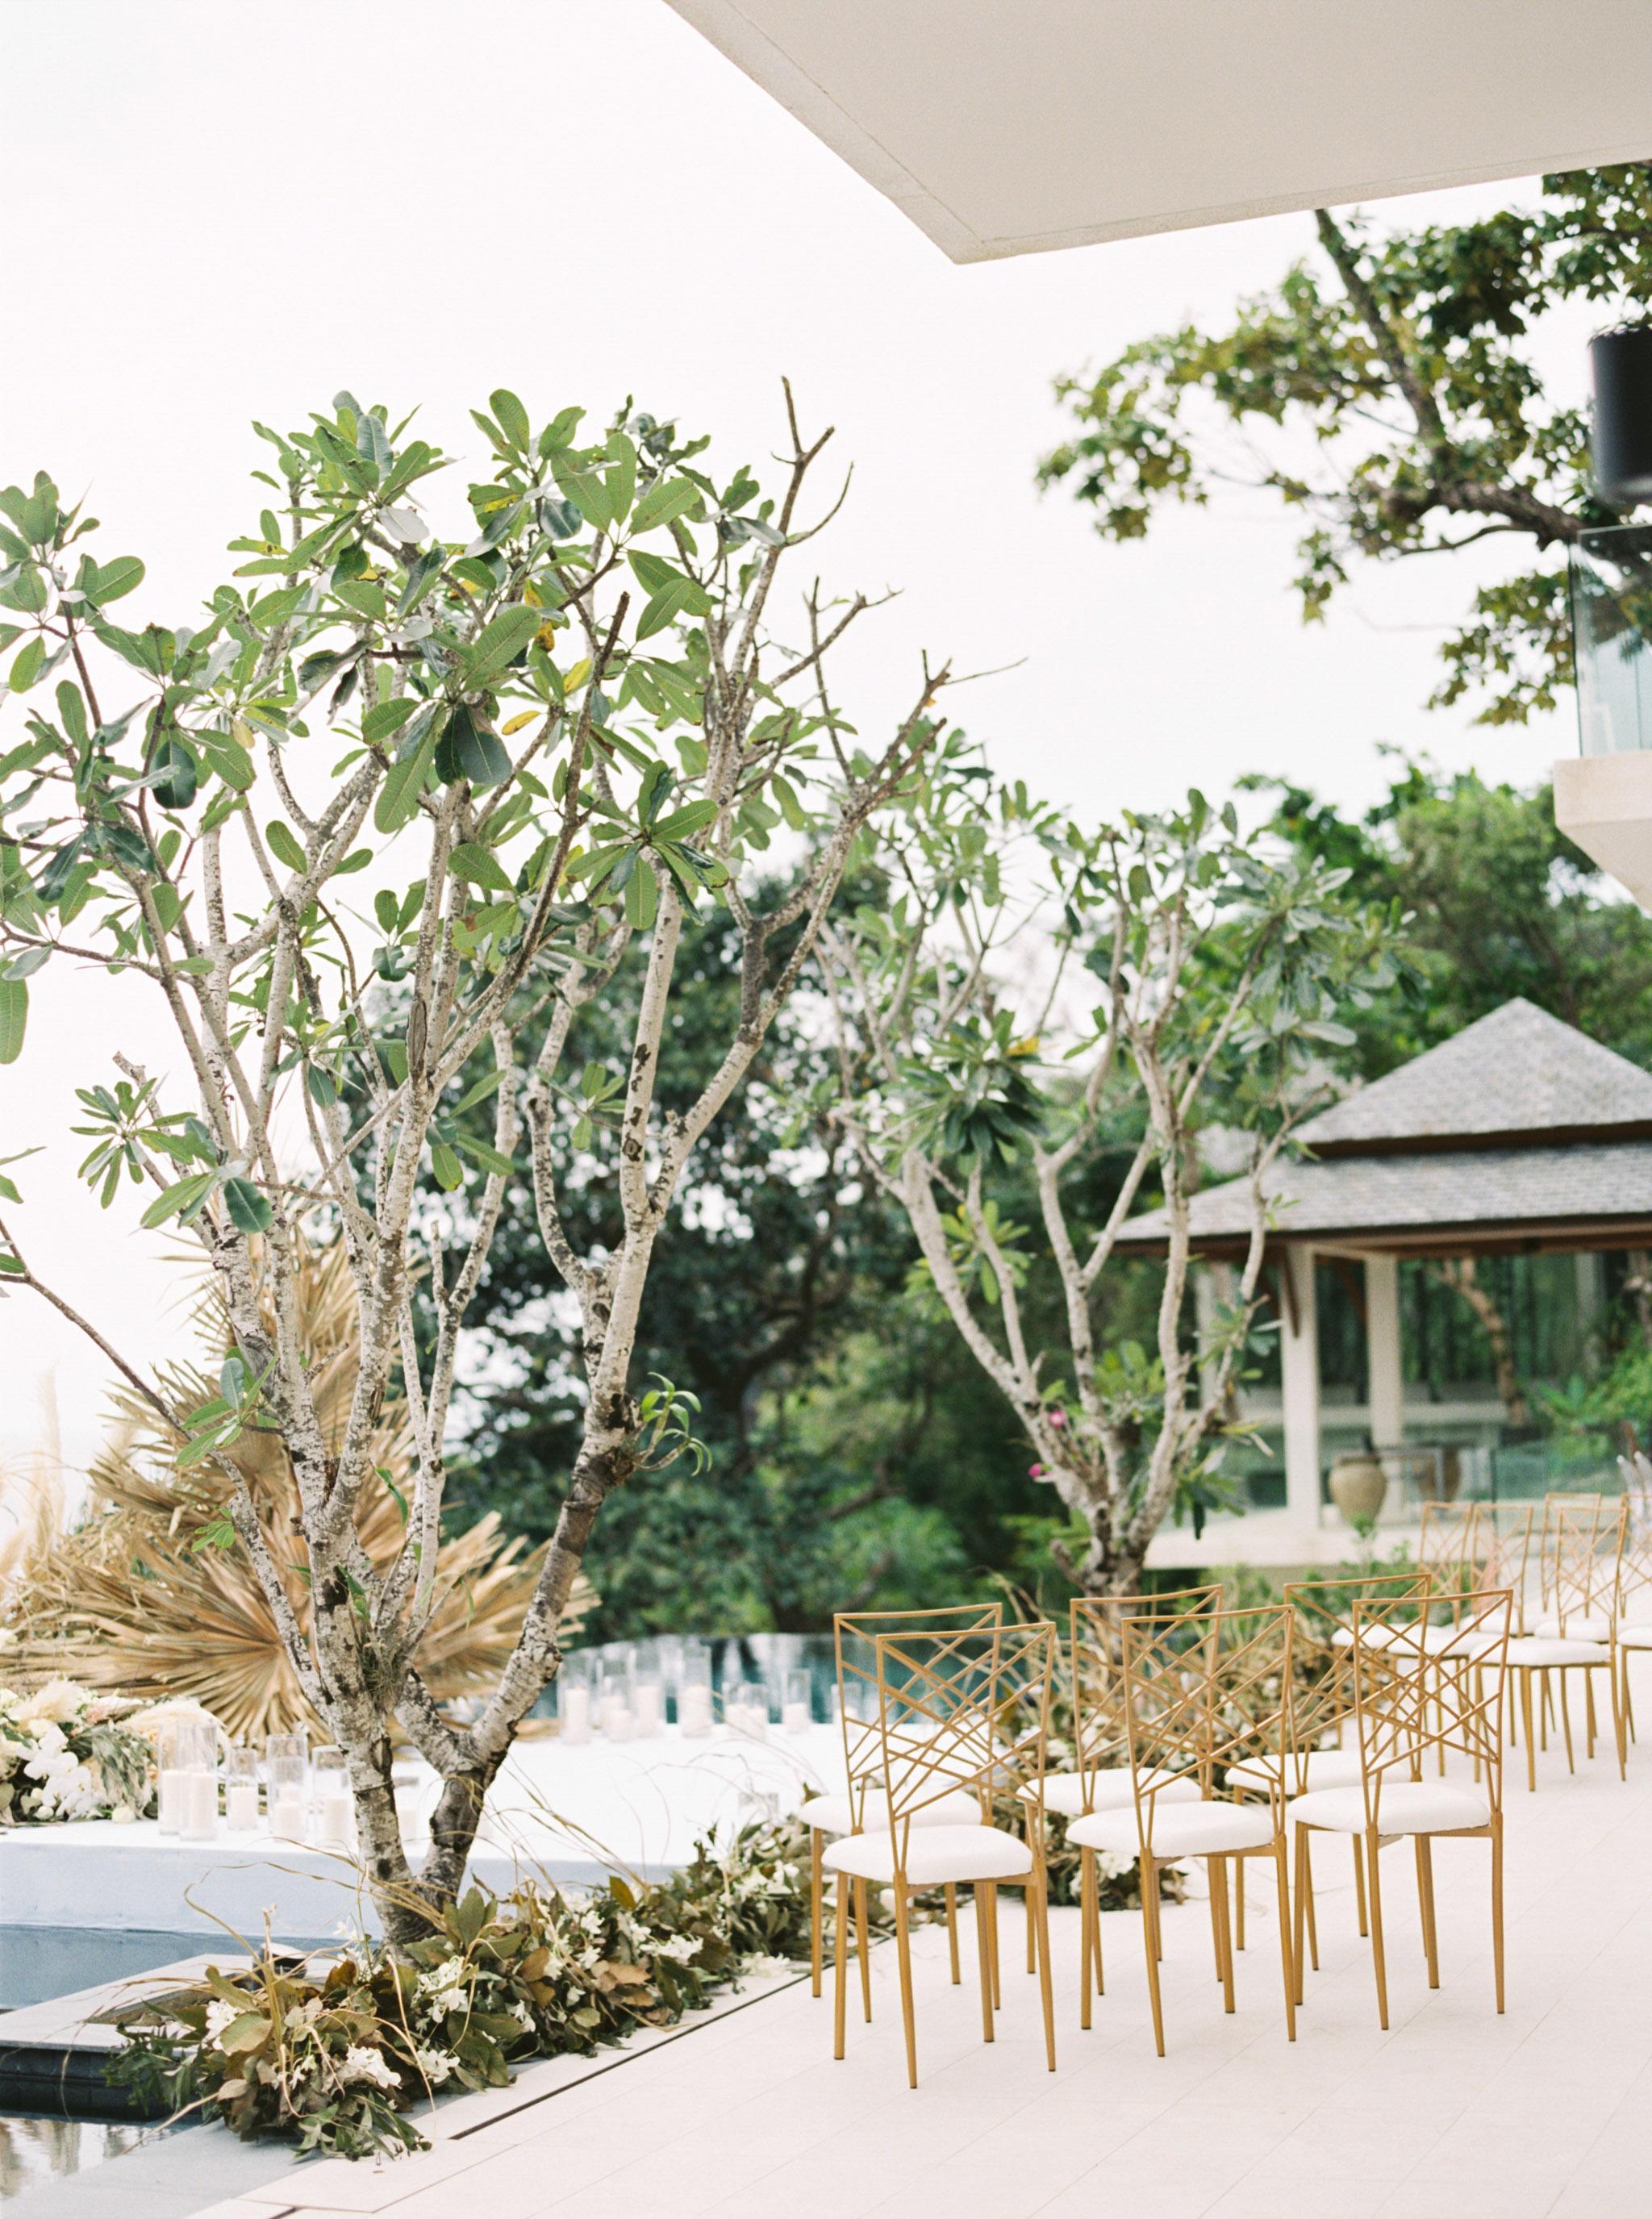 Destination Wedding at The Aquila Luxury Villas in Phuket Thailand Fine Art Film Wedding Photographer Sheri McMahon-00004-4.jpg